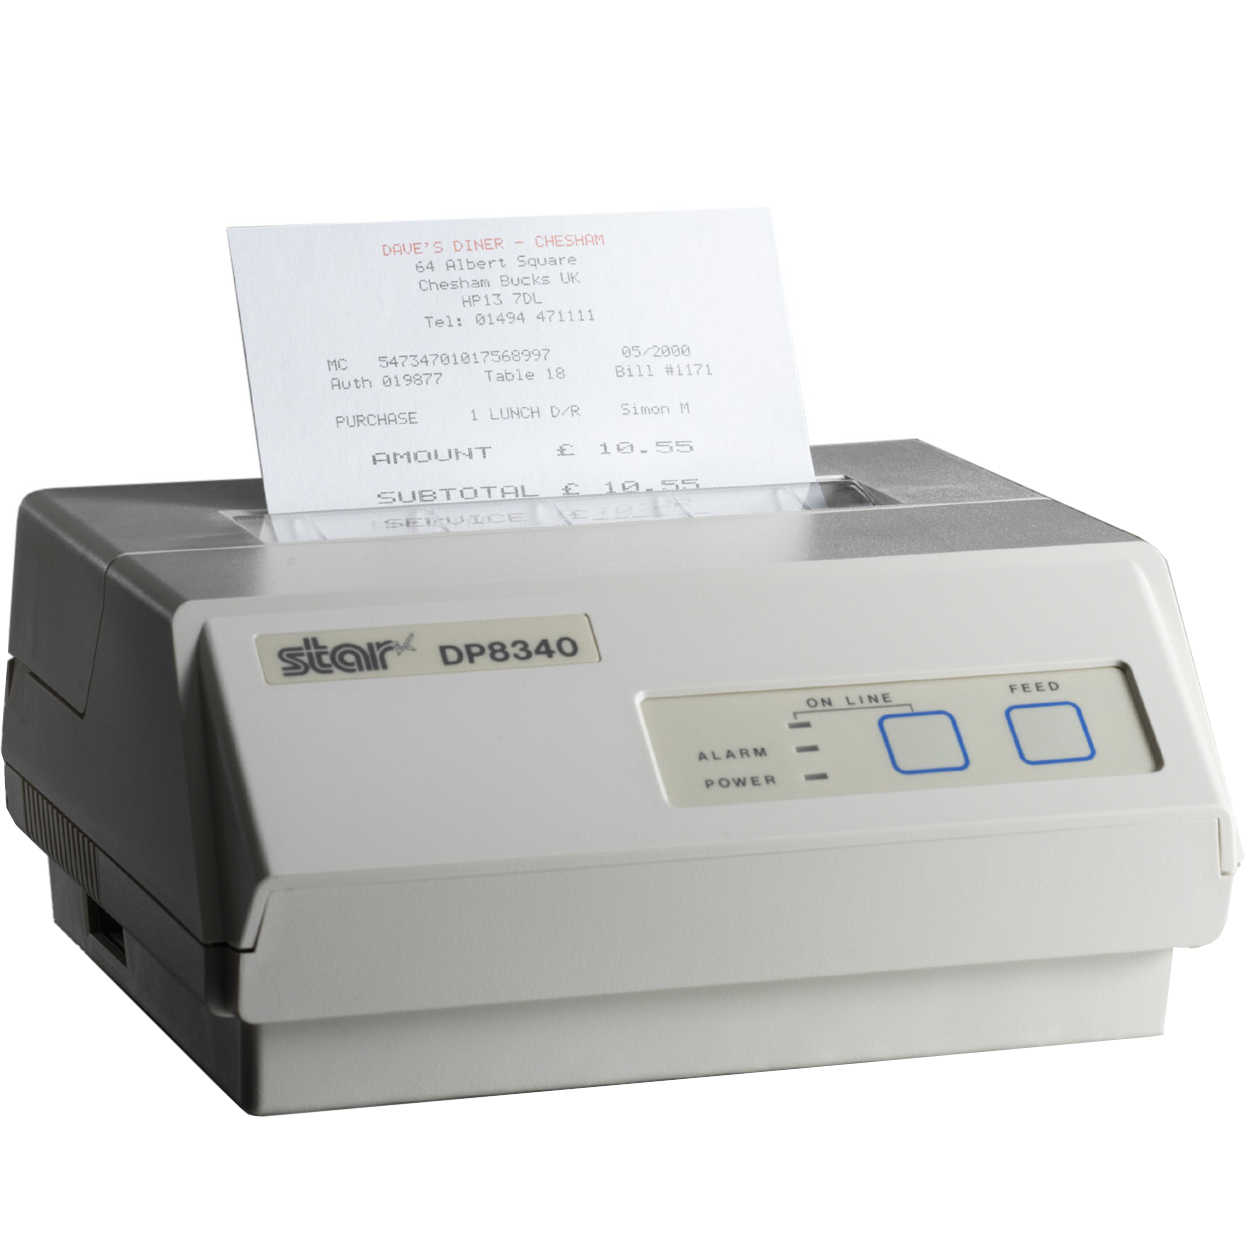 Star Micronics DP8340SC dot matrix printer 406 x 203 DPI